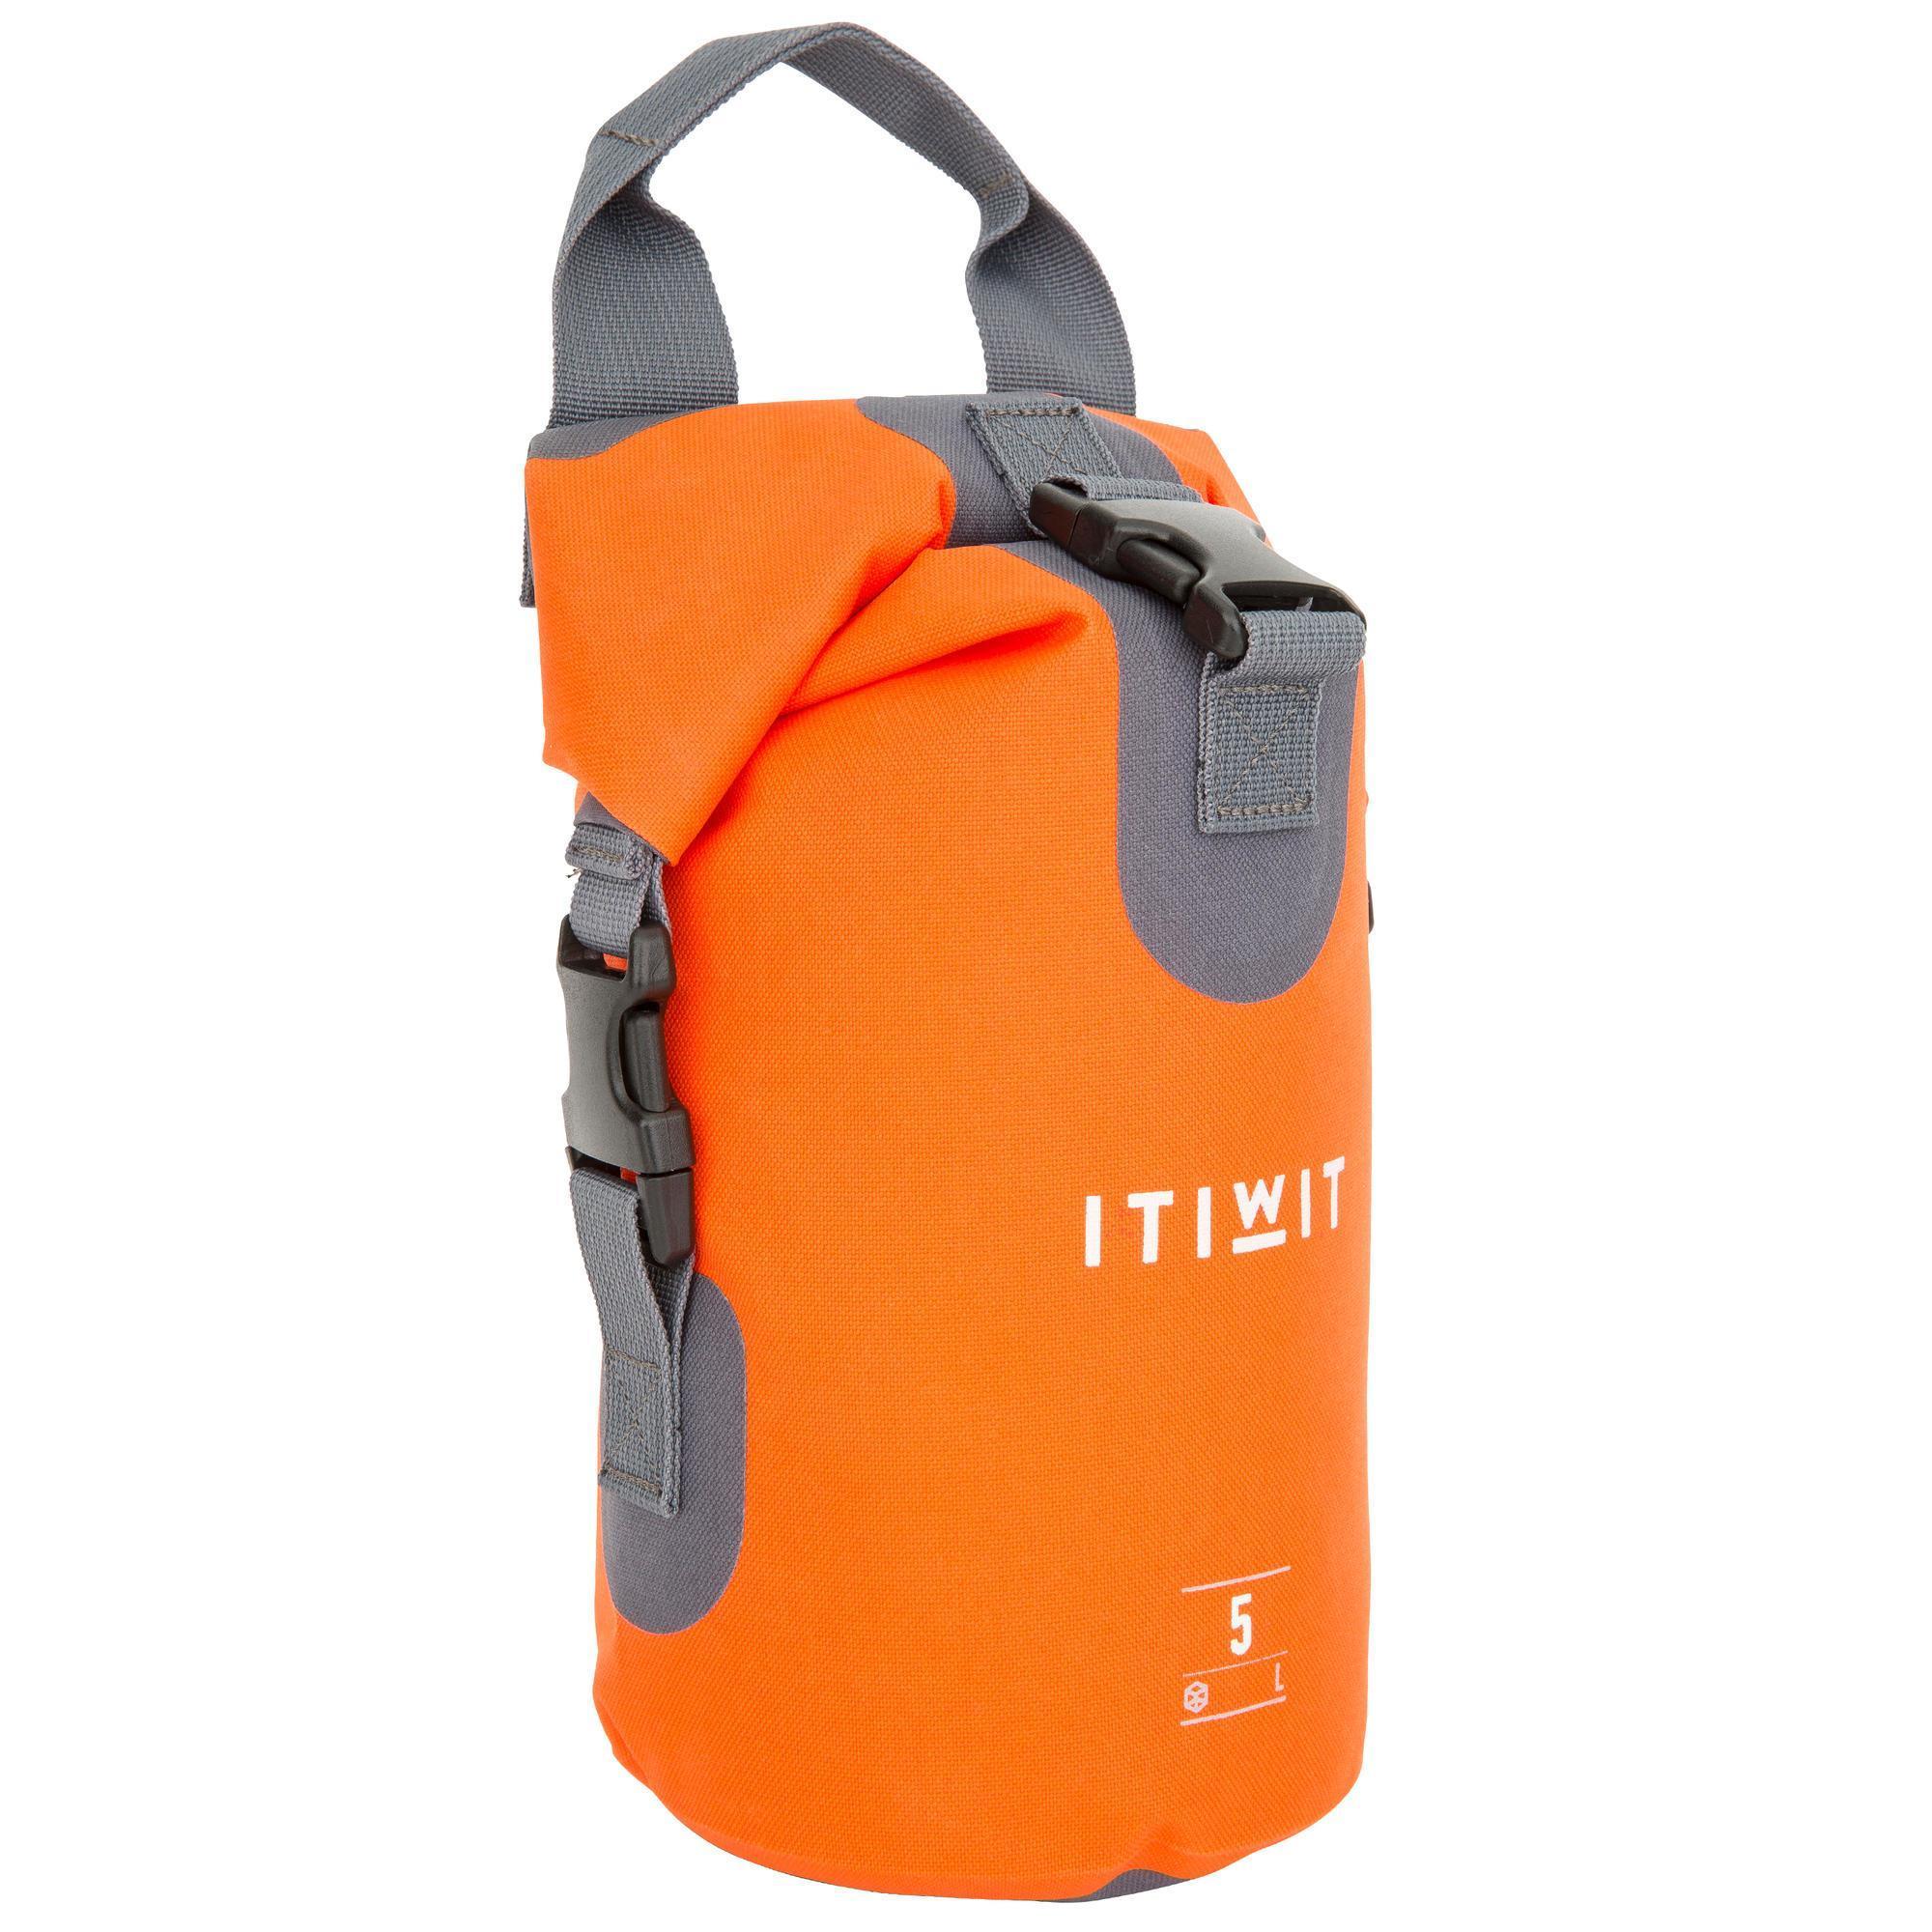 9999b8388af Itiwit Waterdichte duffel bag 5 l oranje zonder schouderriem | Decathlon.nl